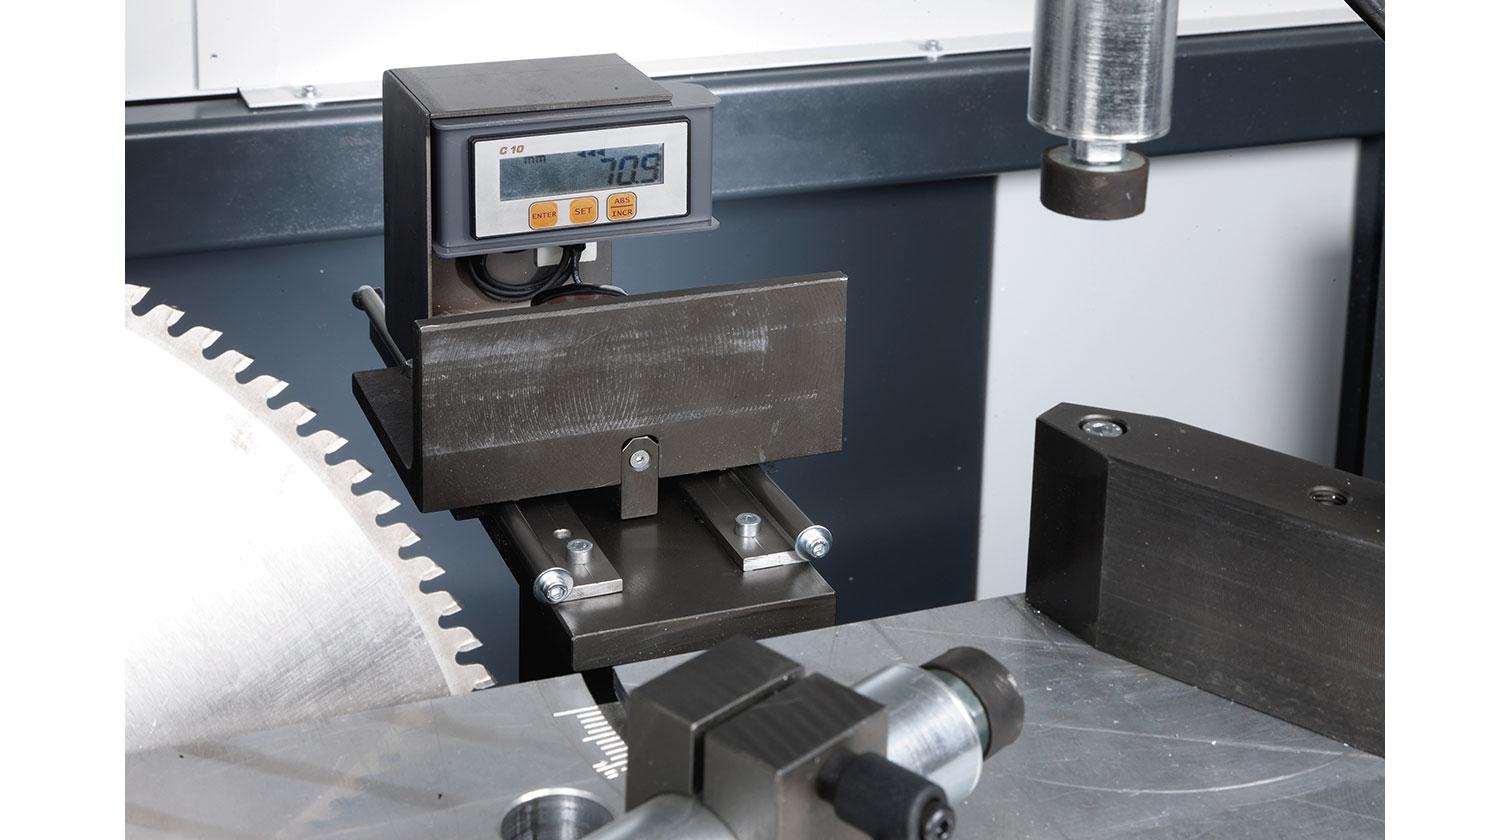 INT aluminum notching saw Pressta Eisele Prisma 500 angle digital reader